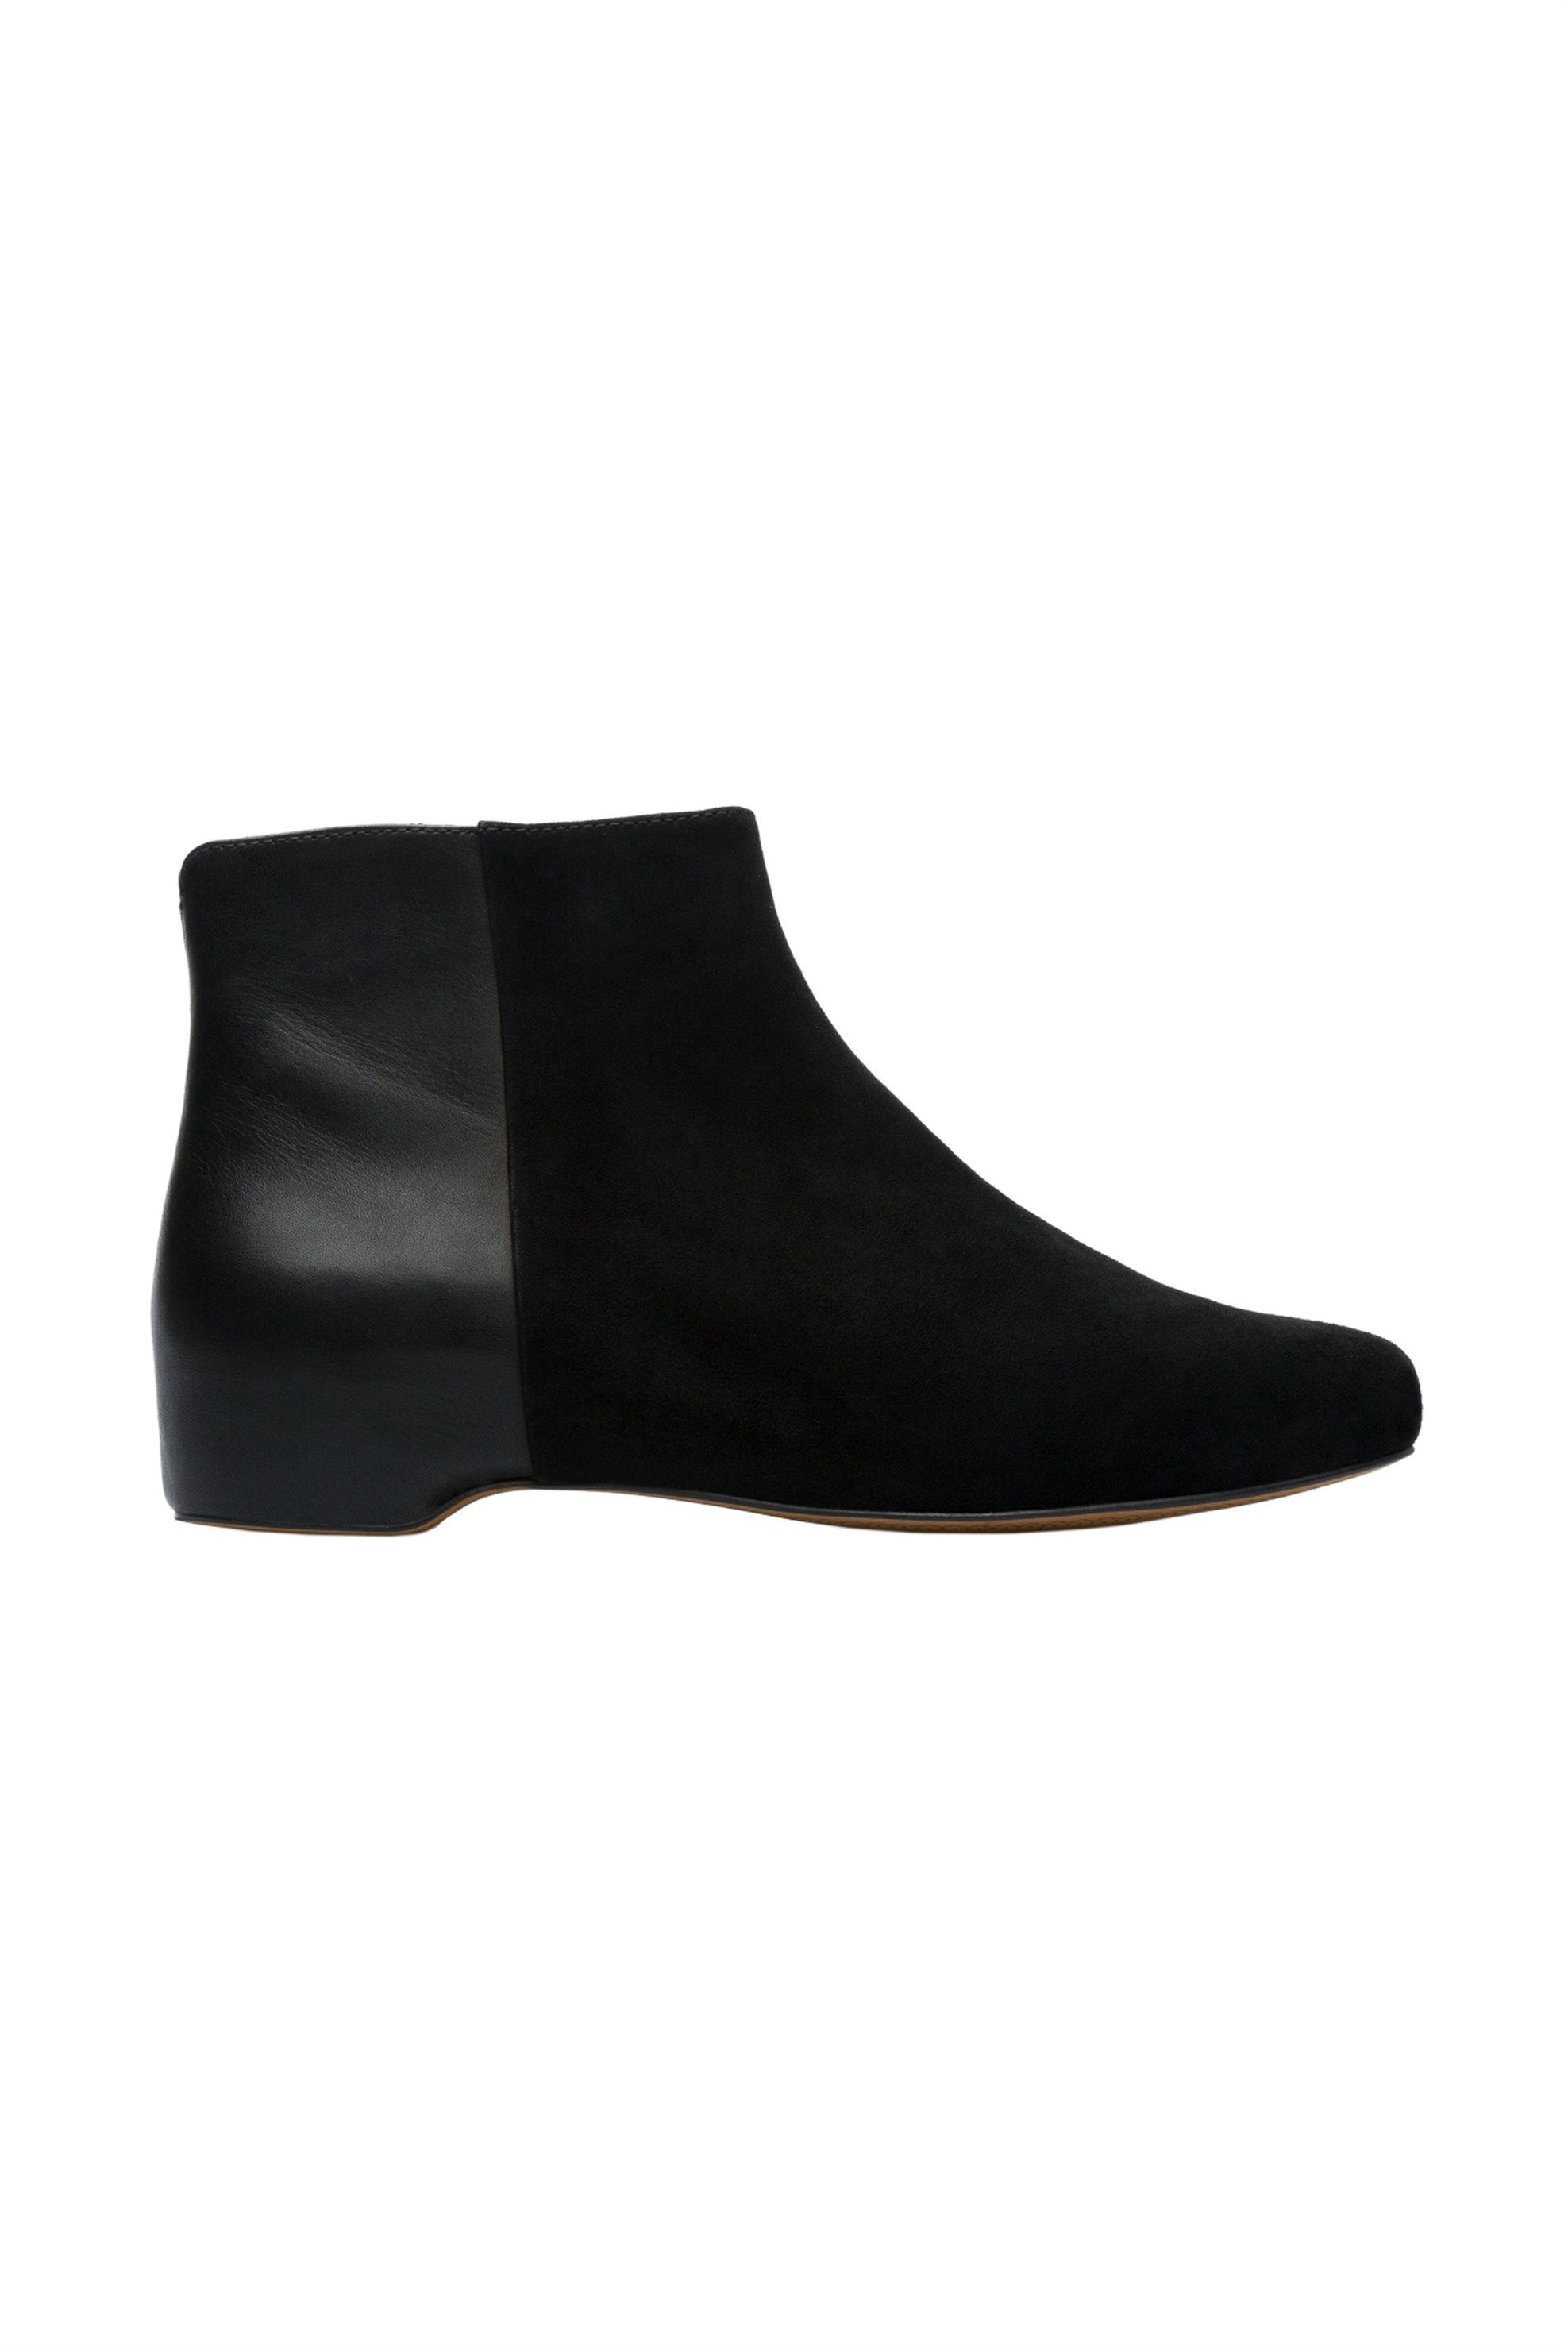 online retailer fbed6 e9229 Notos Camper γυναικεία δερμάτινα μποτάκια Serena suede – K400314-003 – Μαύρο